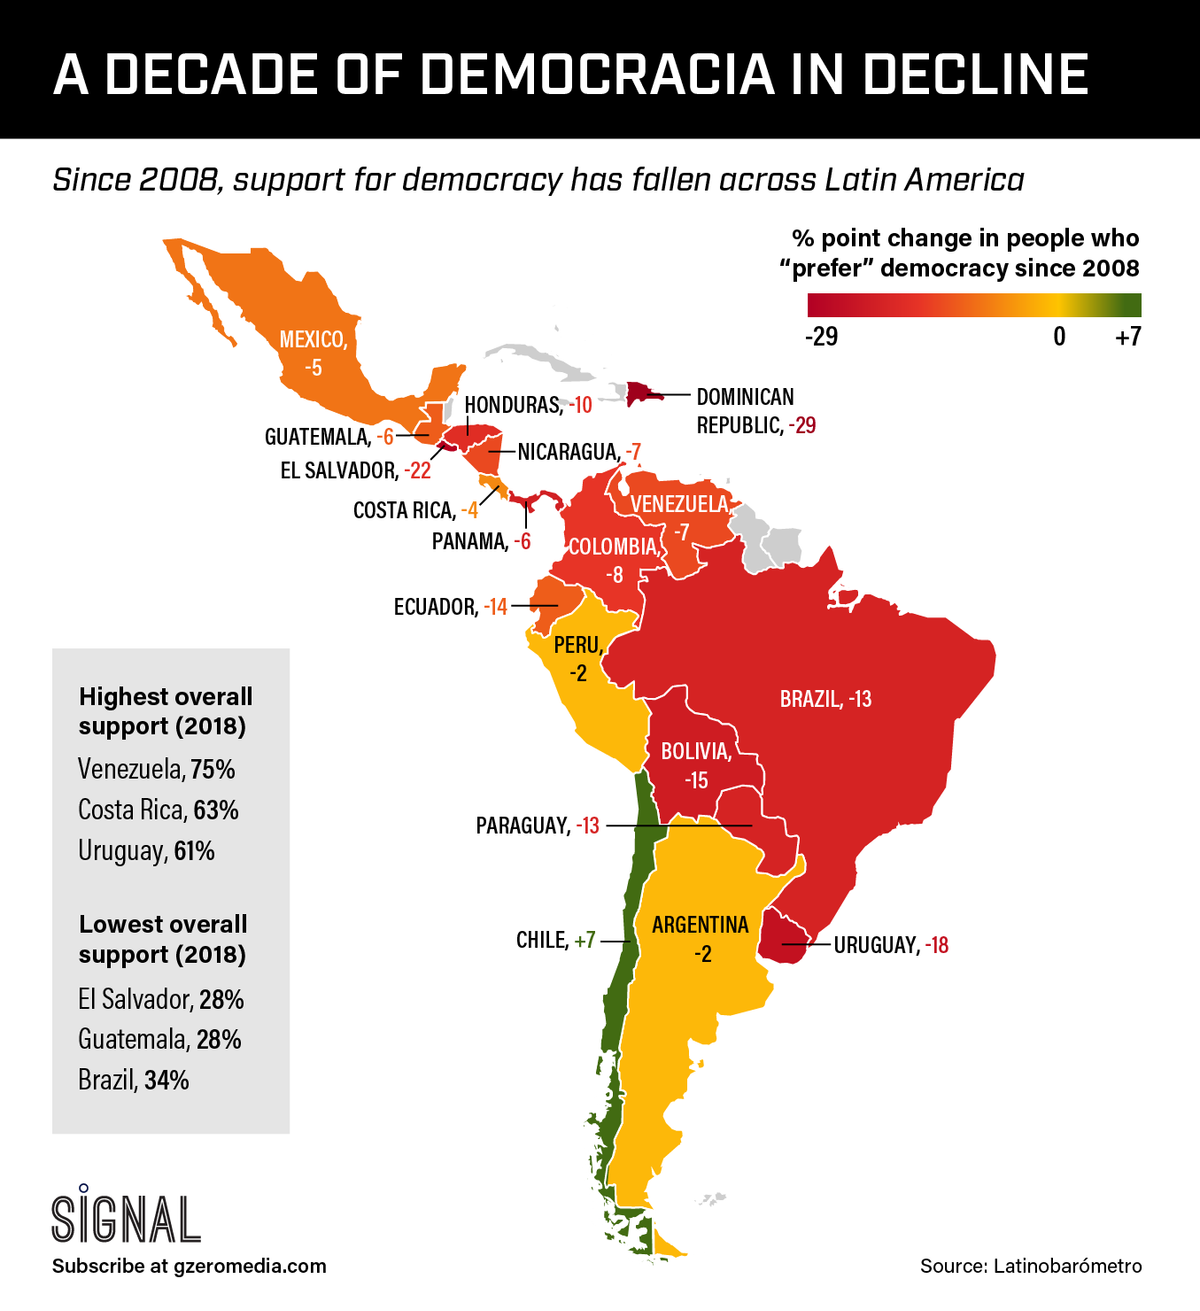 DEMOCRACIA IN DECLINE?